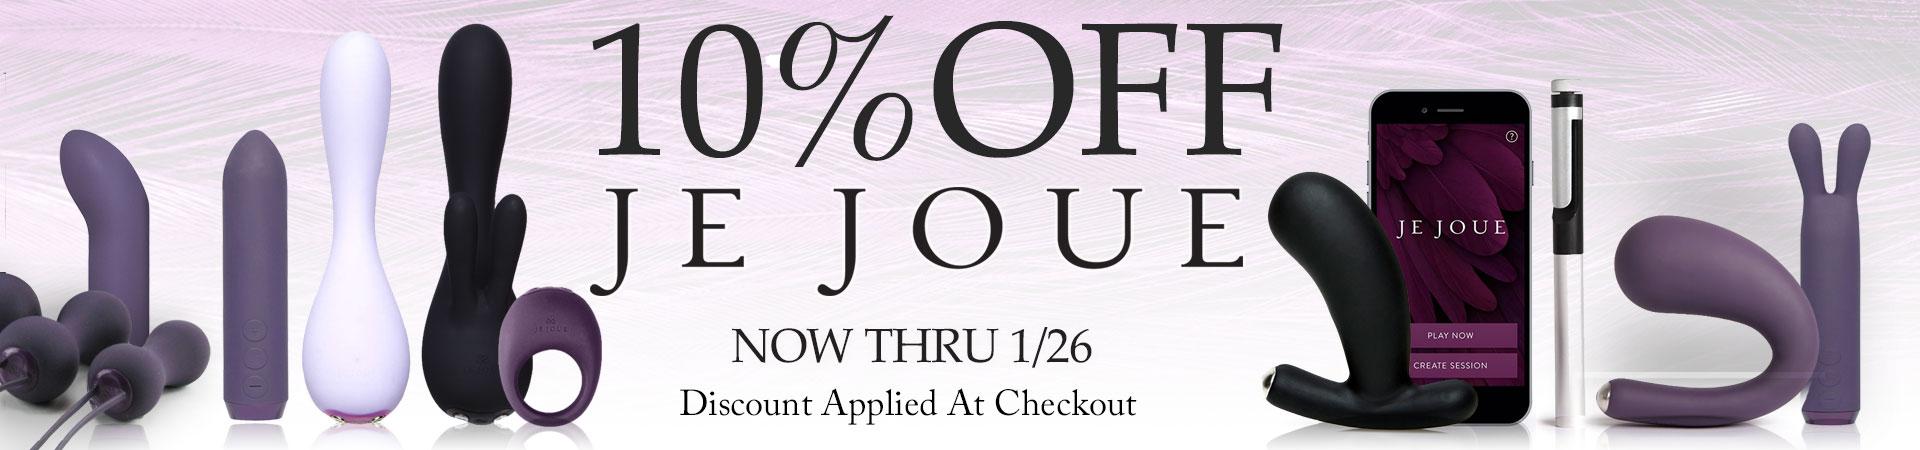 10% Off Je Joue - Now Thru 1/26